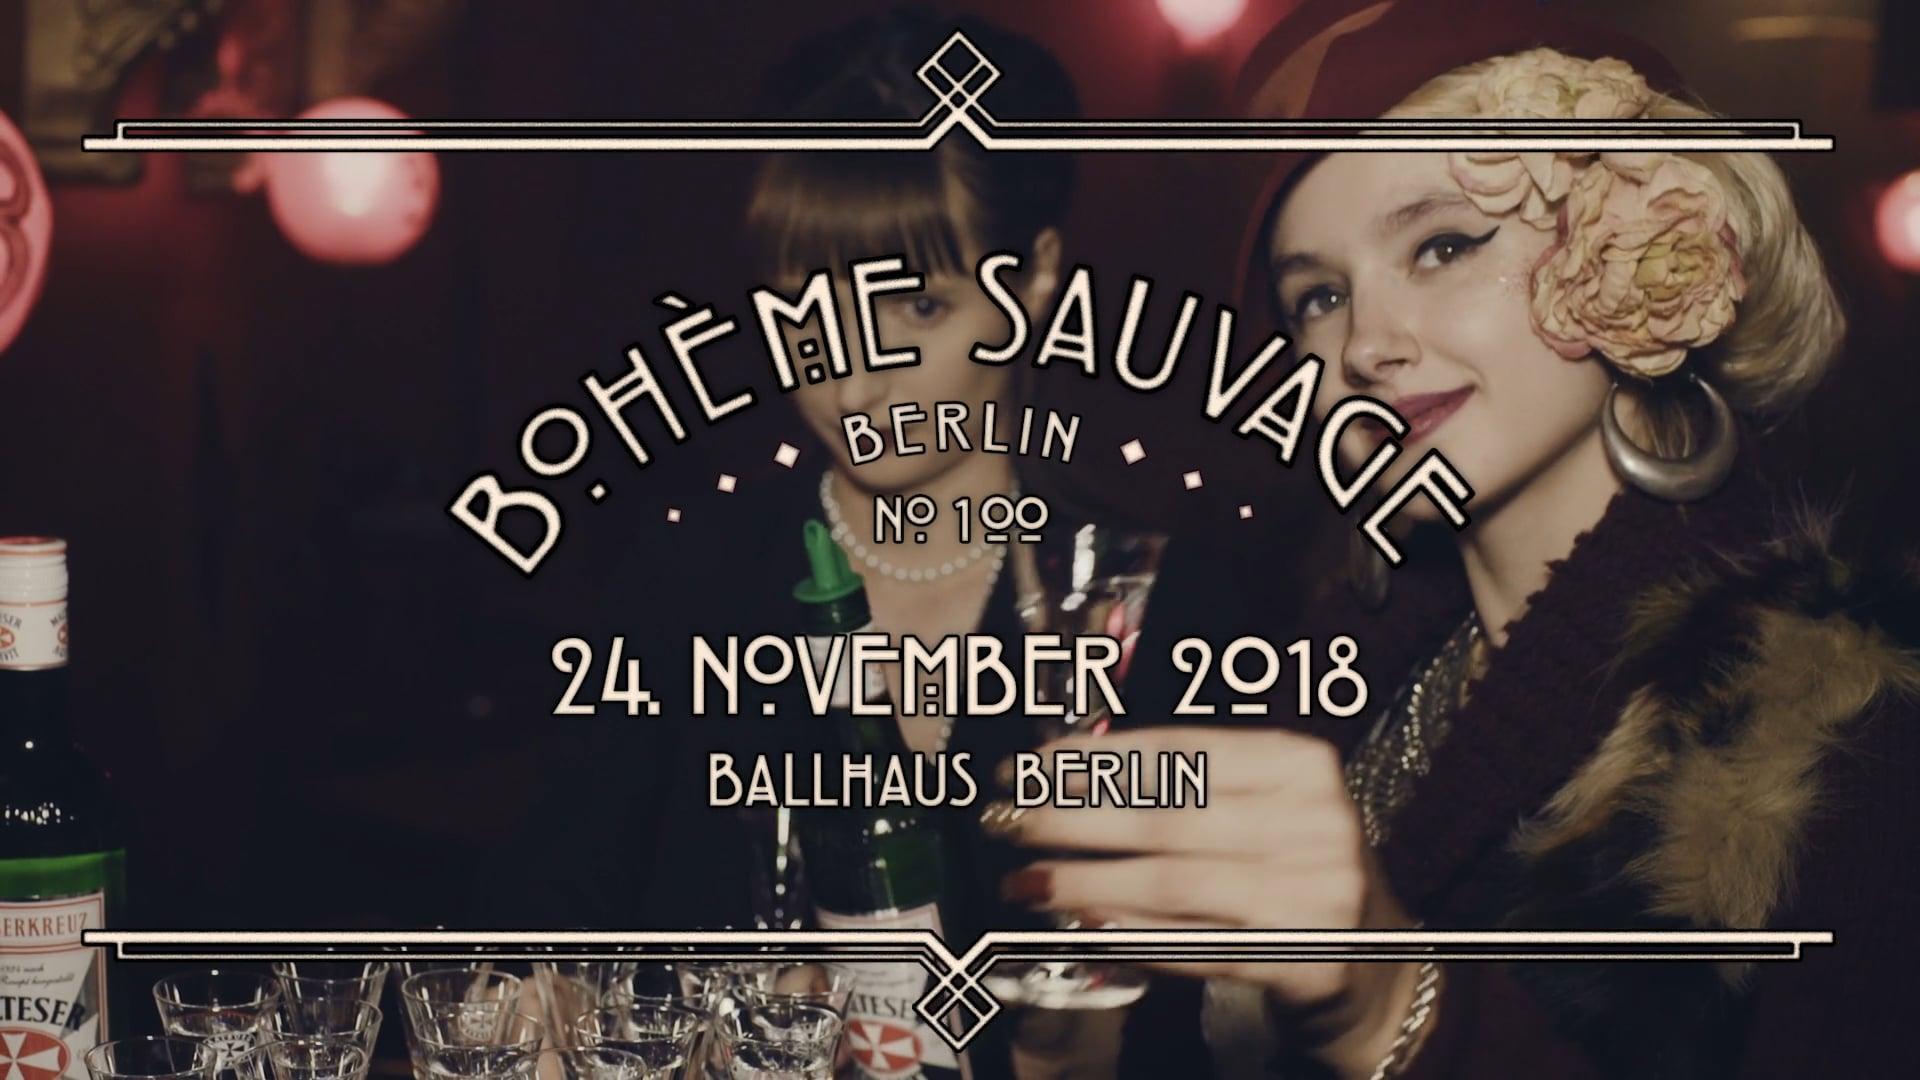 Bohème Sauvage Berlin Nº100 - 24. November 2018 - Ballhaus